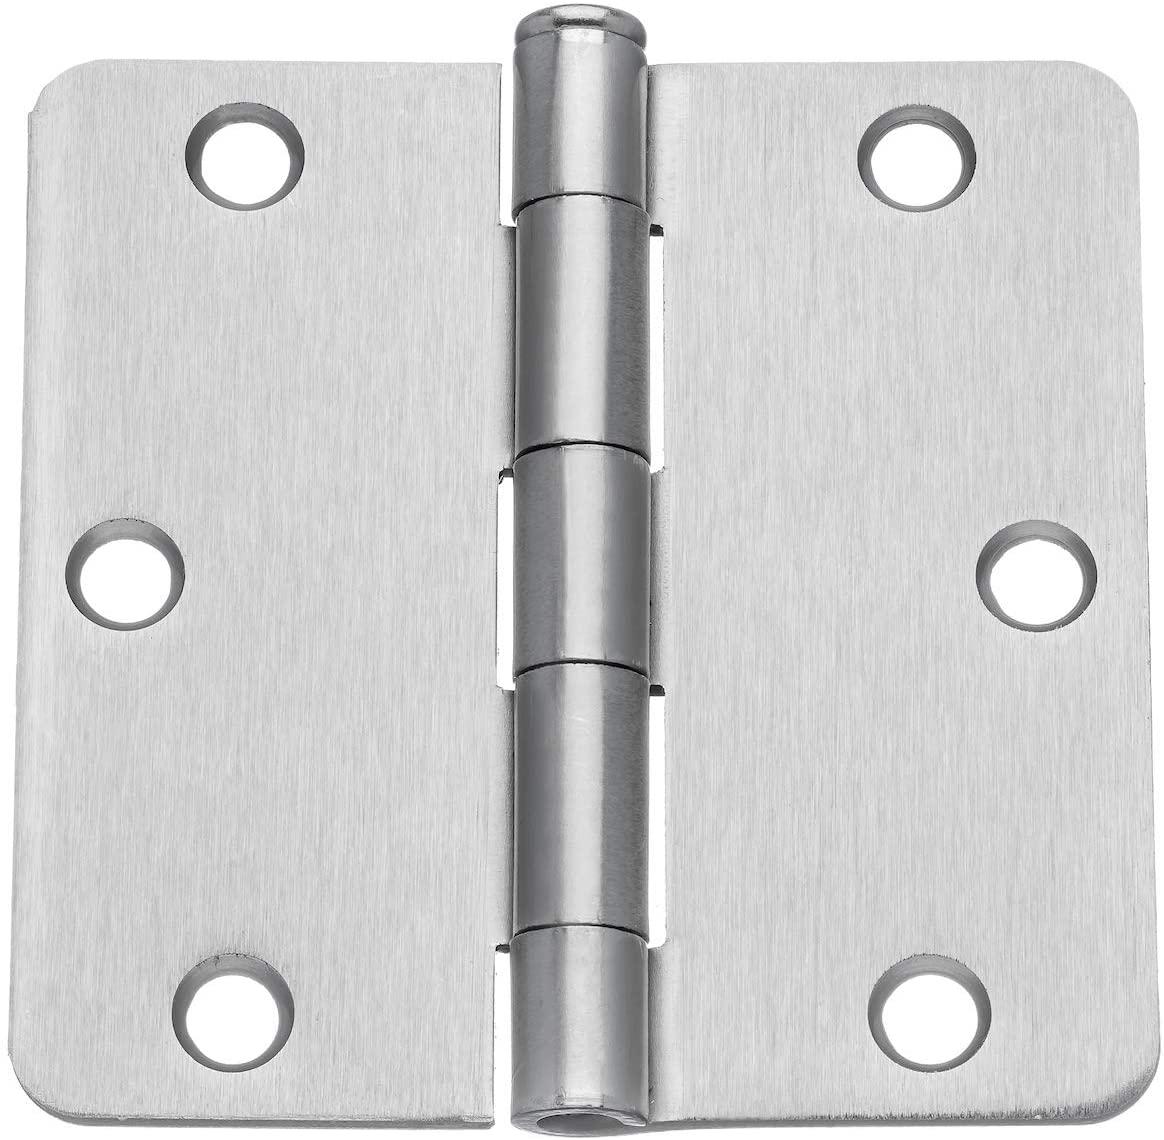 Dynasty Hardware 3-1/2 Door Hinges 1/4 Radius Corner, Satin Nickel, 2 - Pack